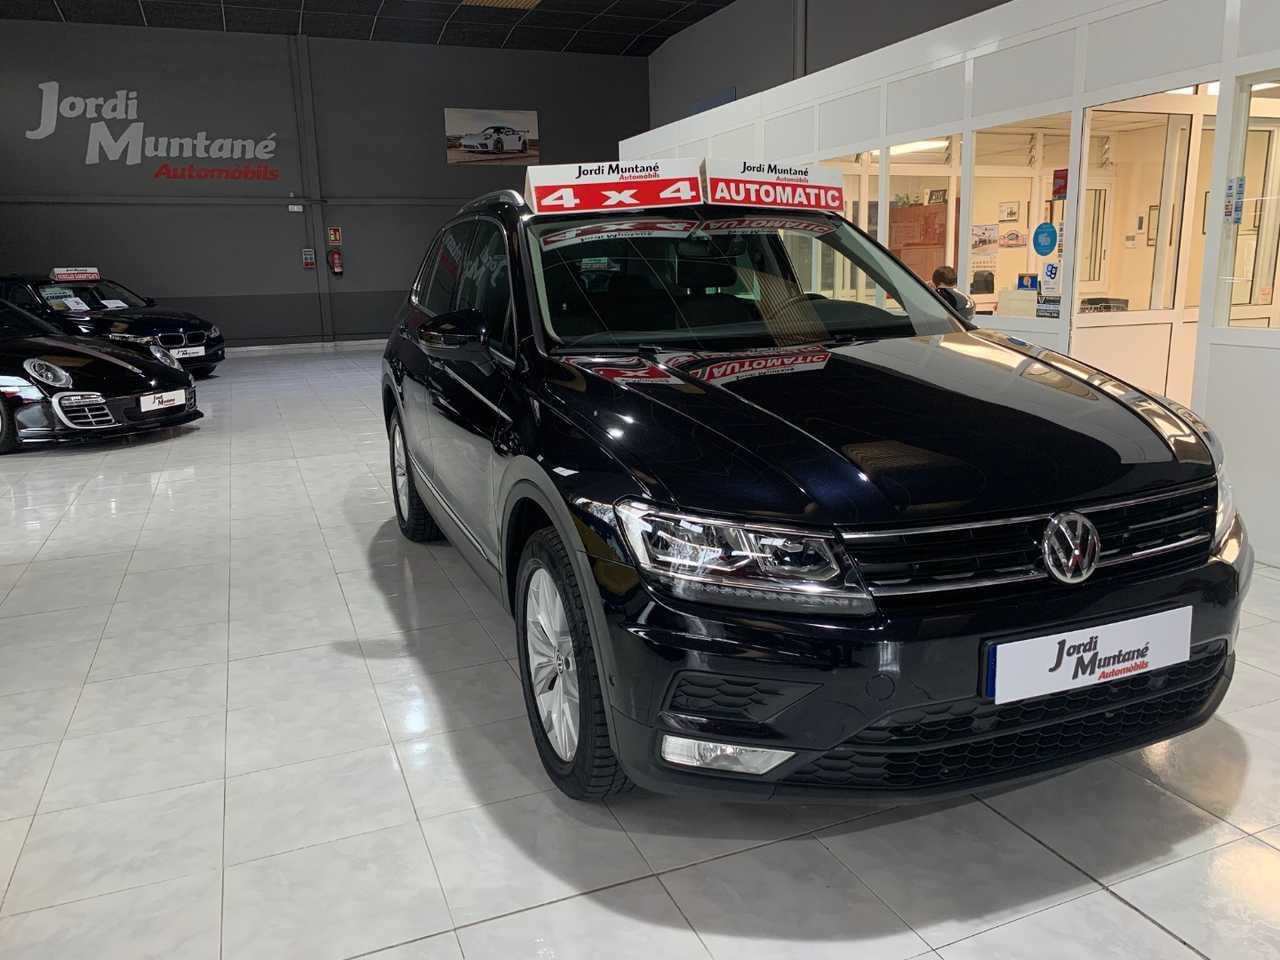 Volkswagen Tiguan 2.0 TDI 150cv -. '' 4 MOTION '' .- Automático DSG 7 vel -.